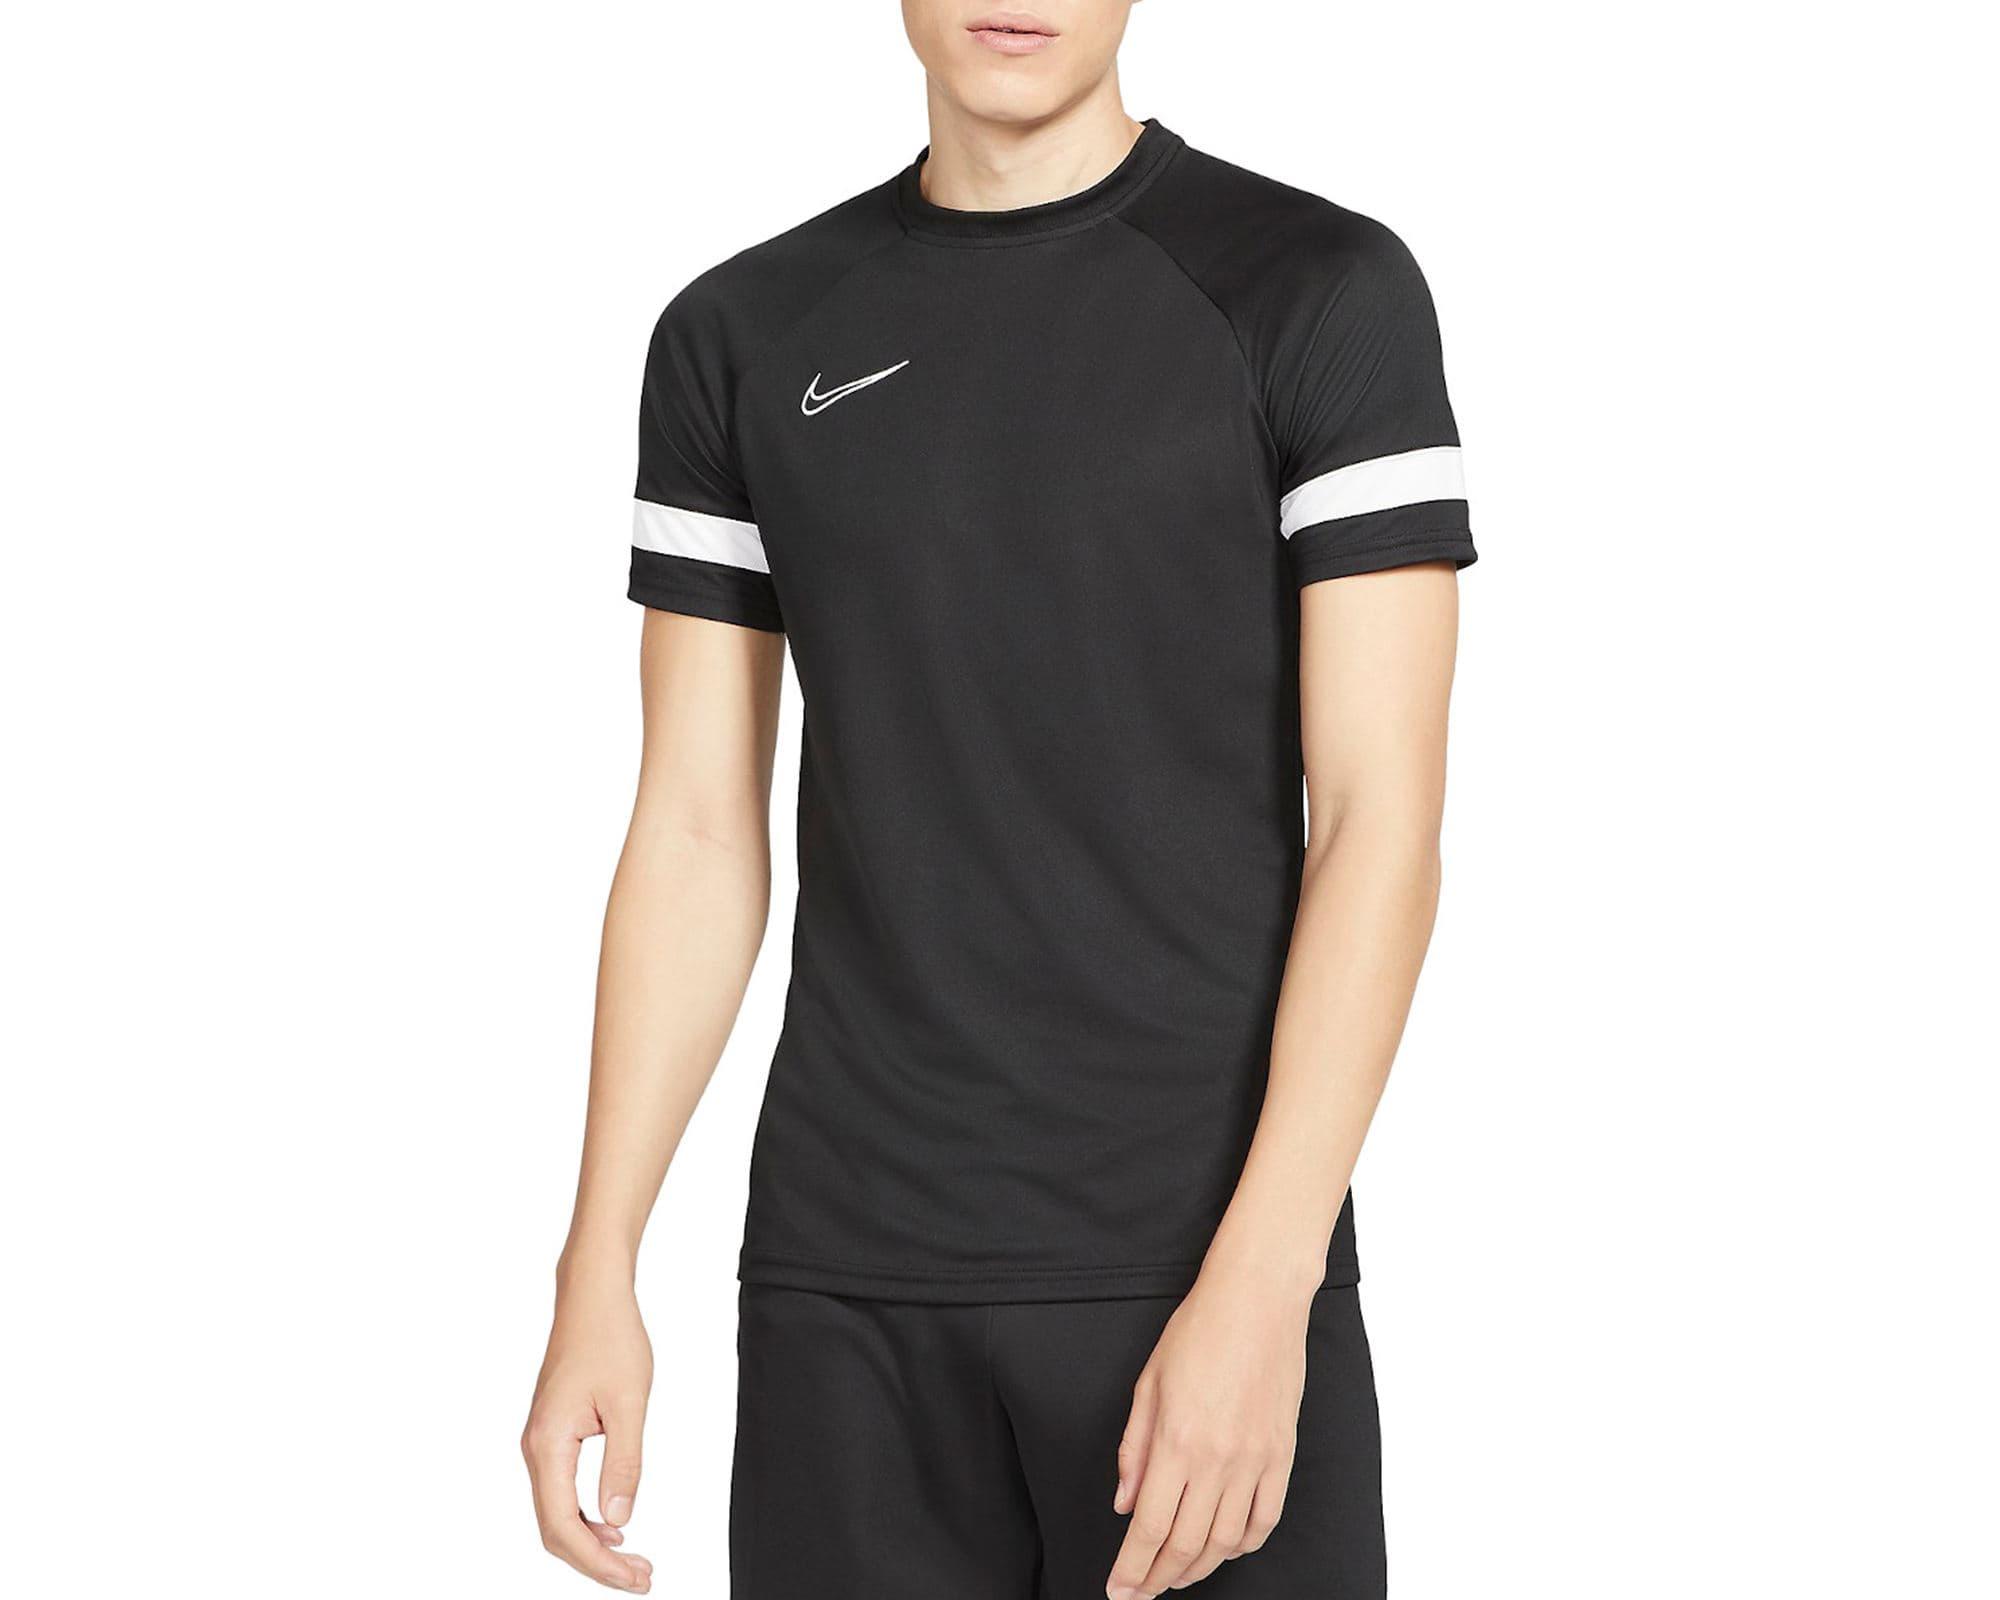 Academy 21 Erkek Siyah Futbol Tişört (CW6101-010)